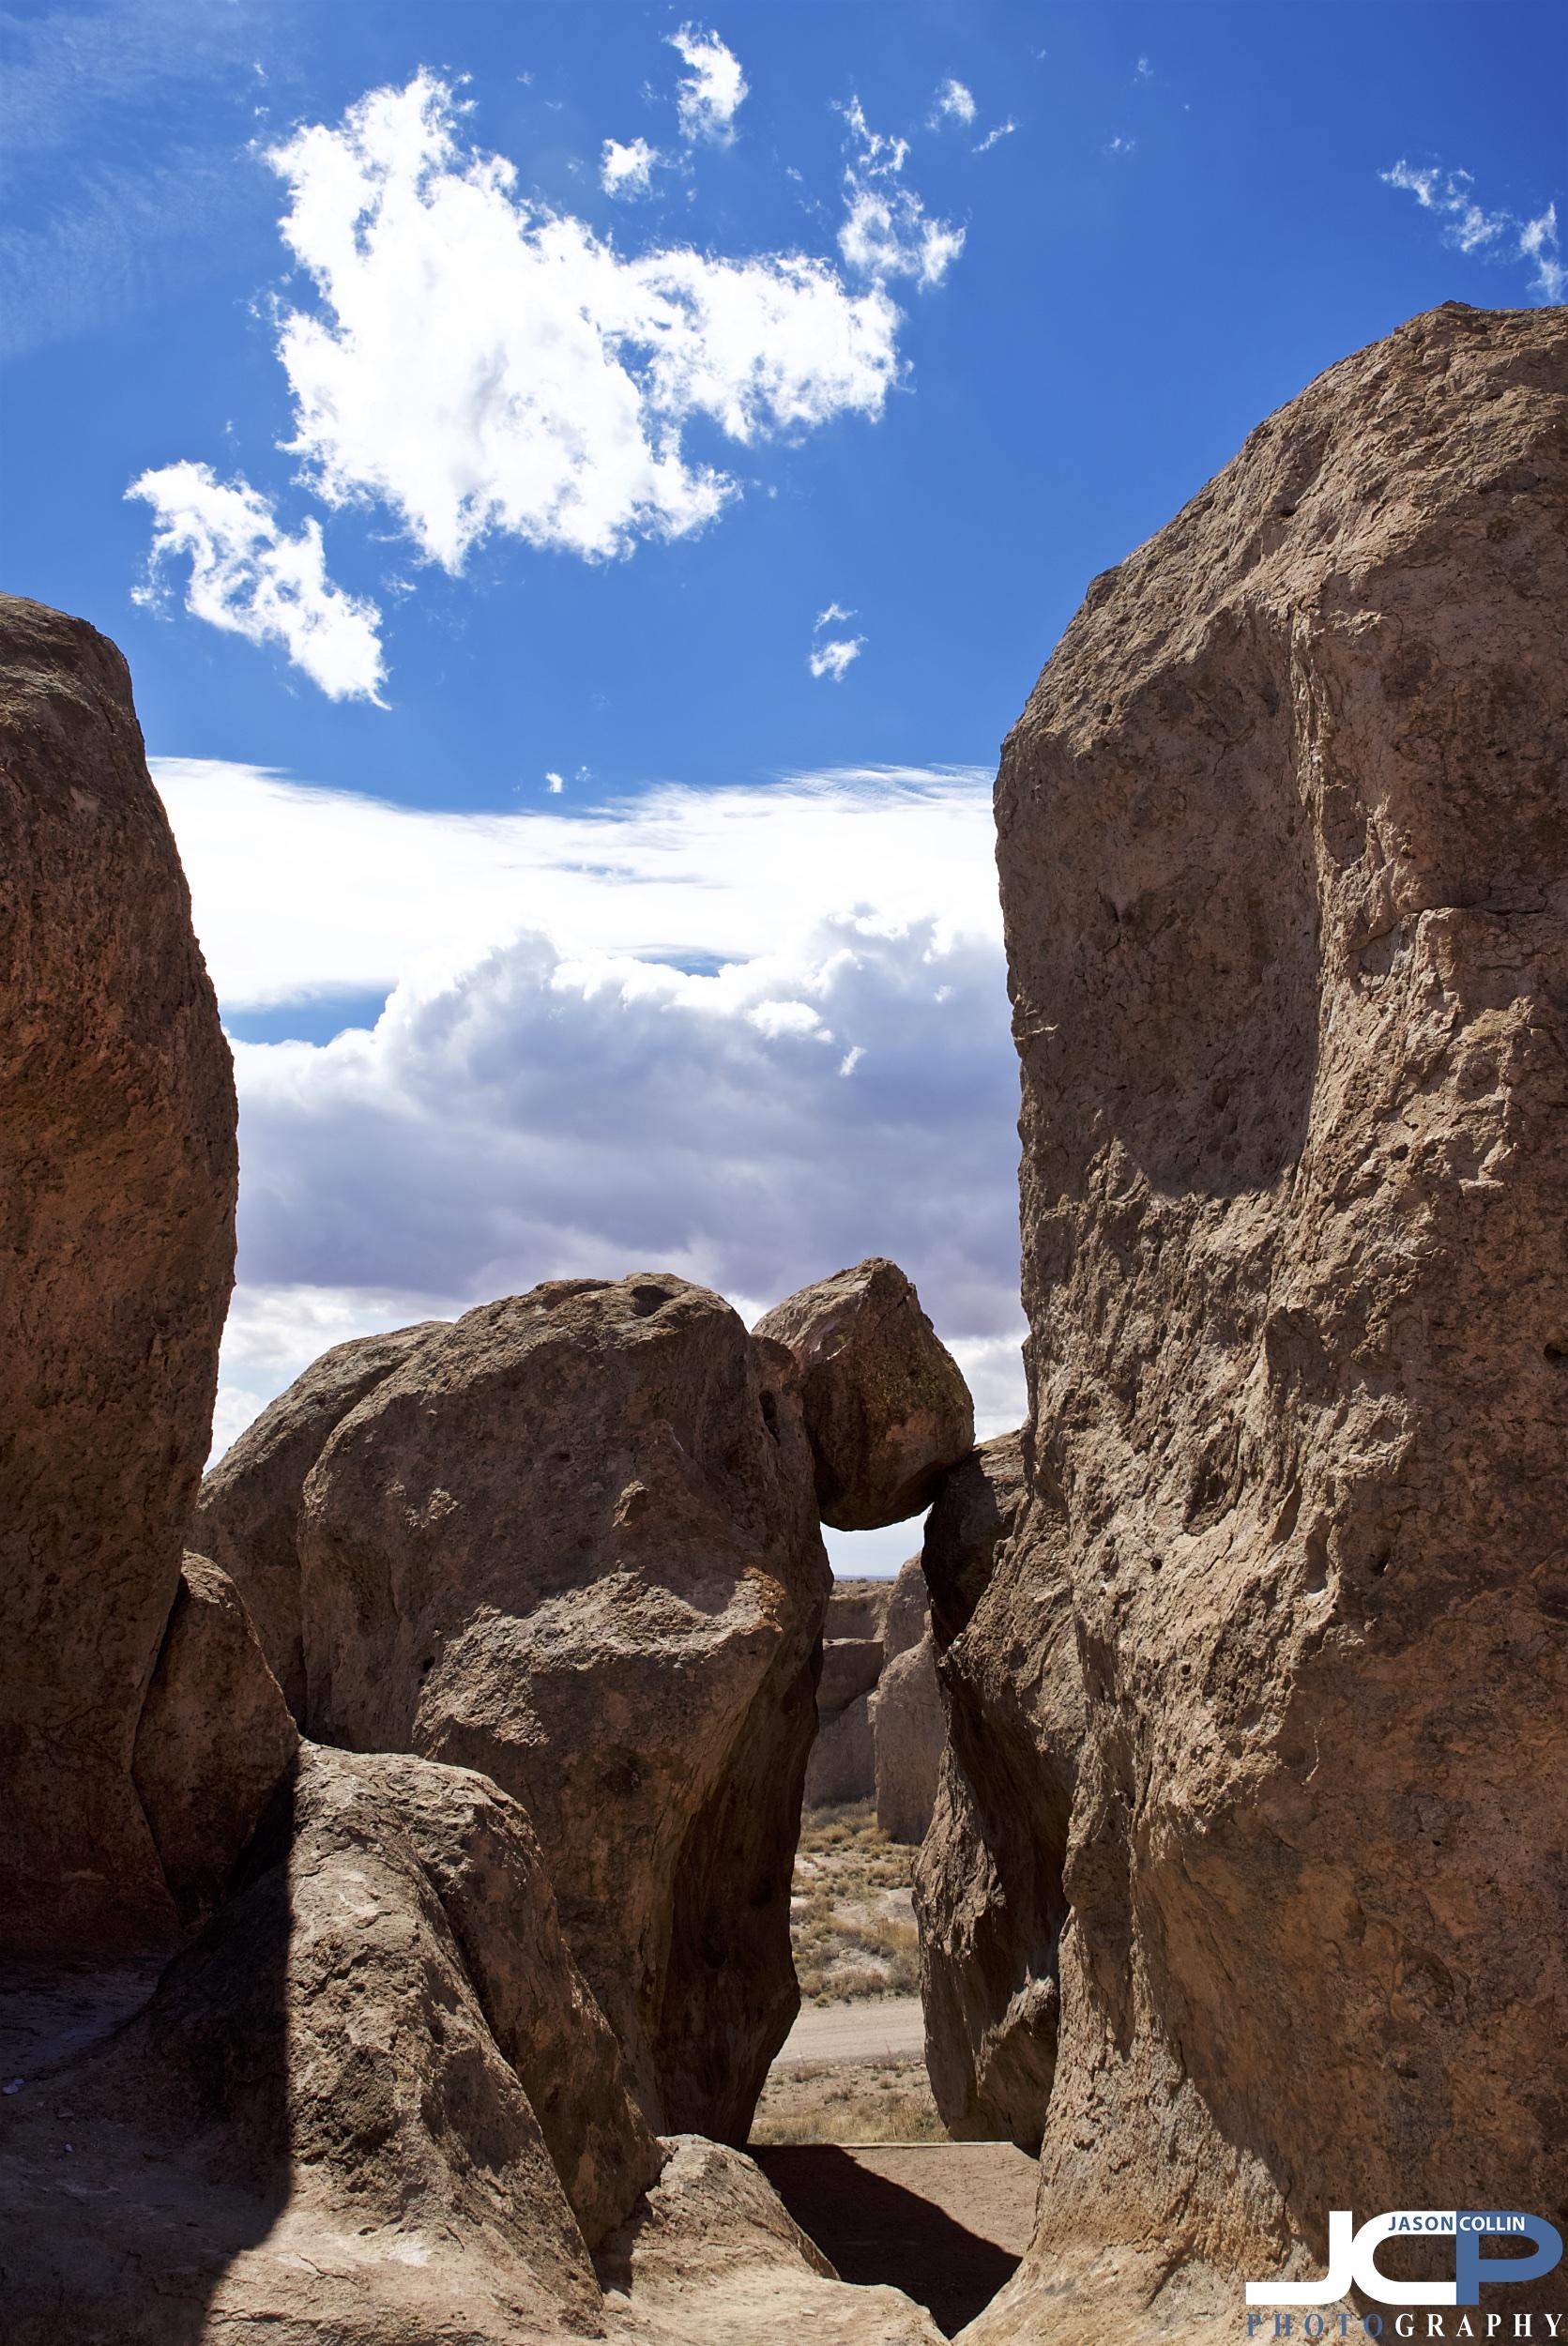 city-of-rocks-3-11-2019-nm-122765.jpg